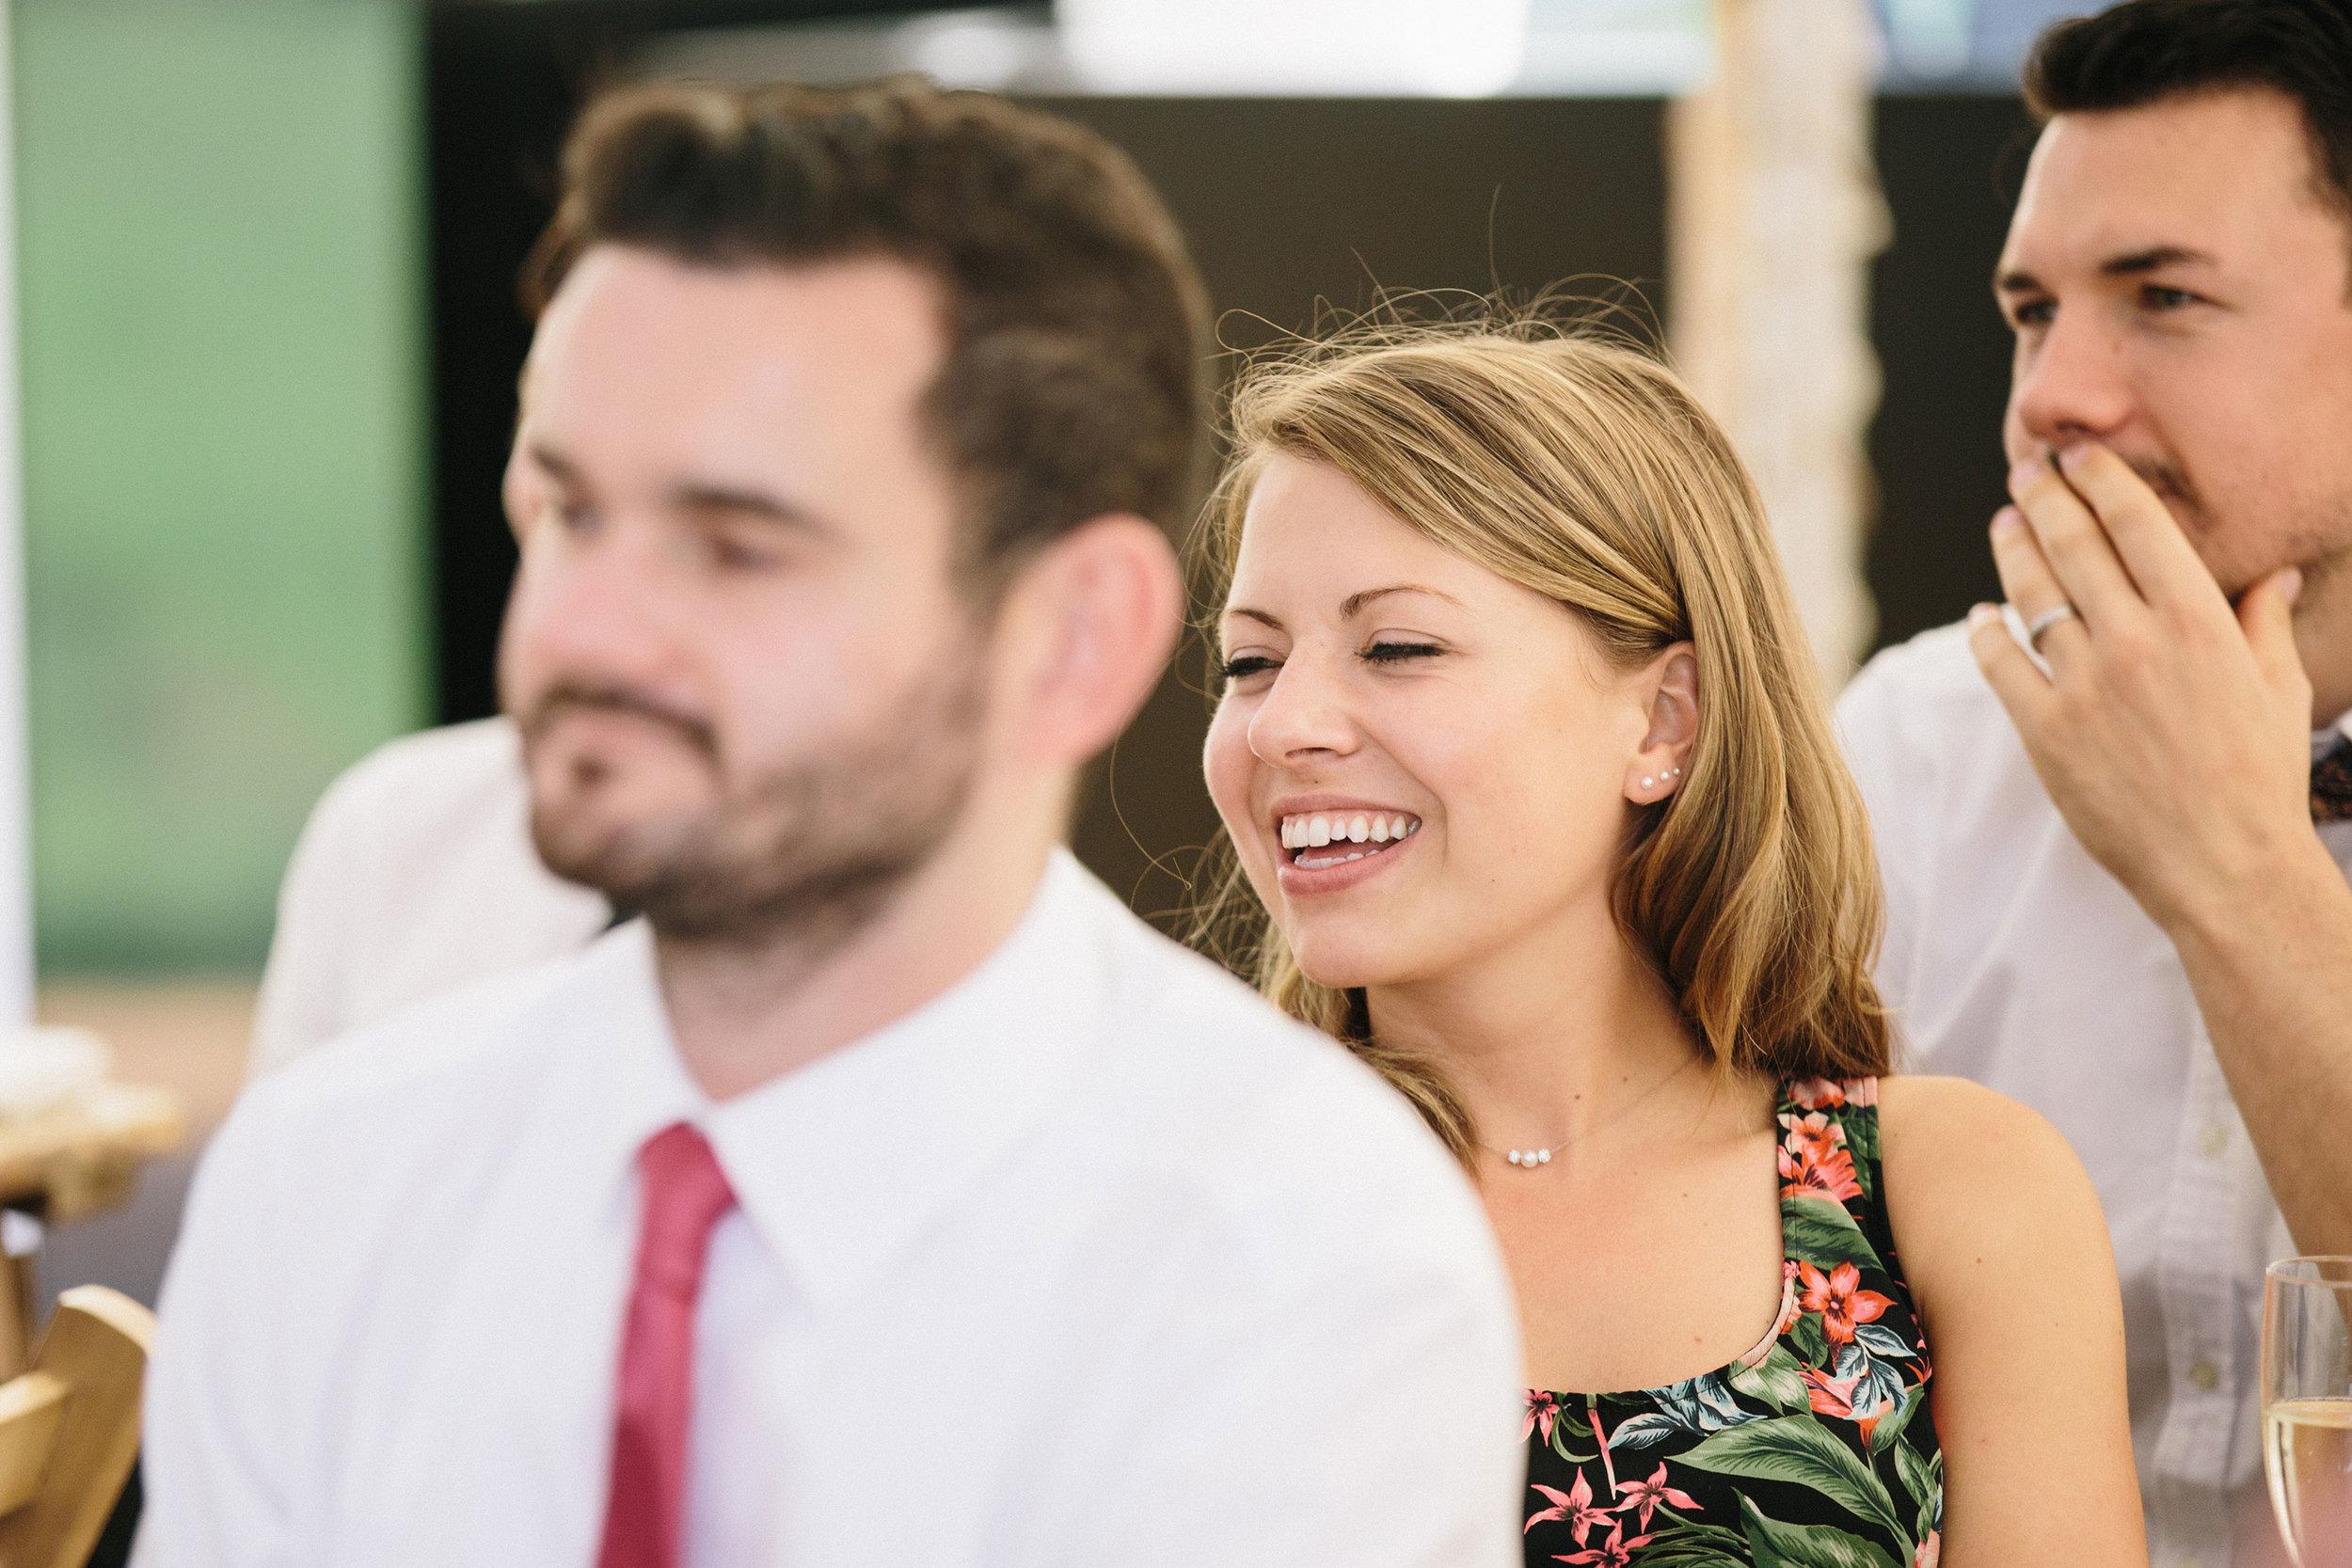 Becky-&-Jon---Aug16---Michael-Newington-Gray-559.jpg